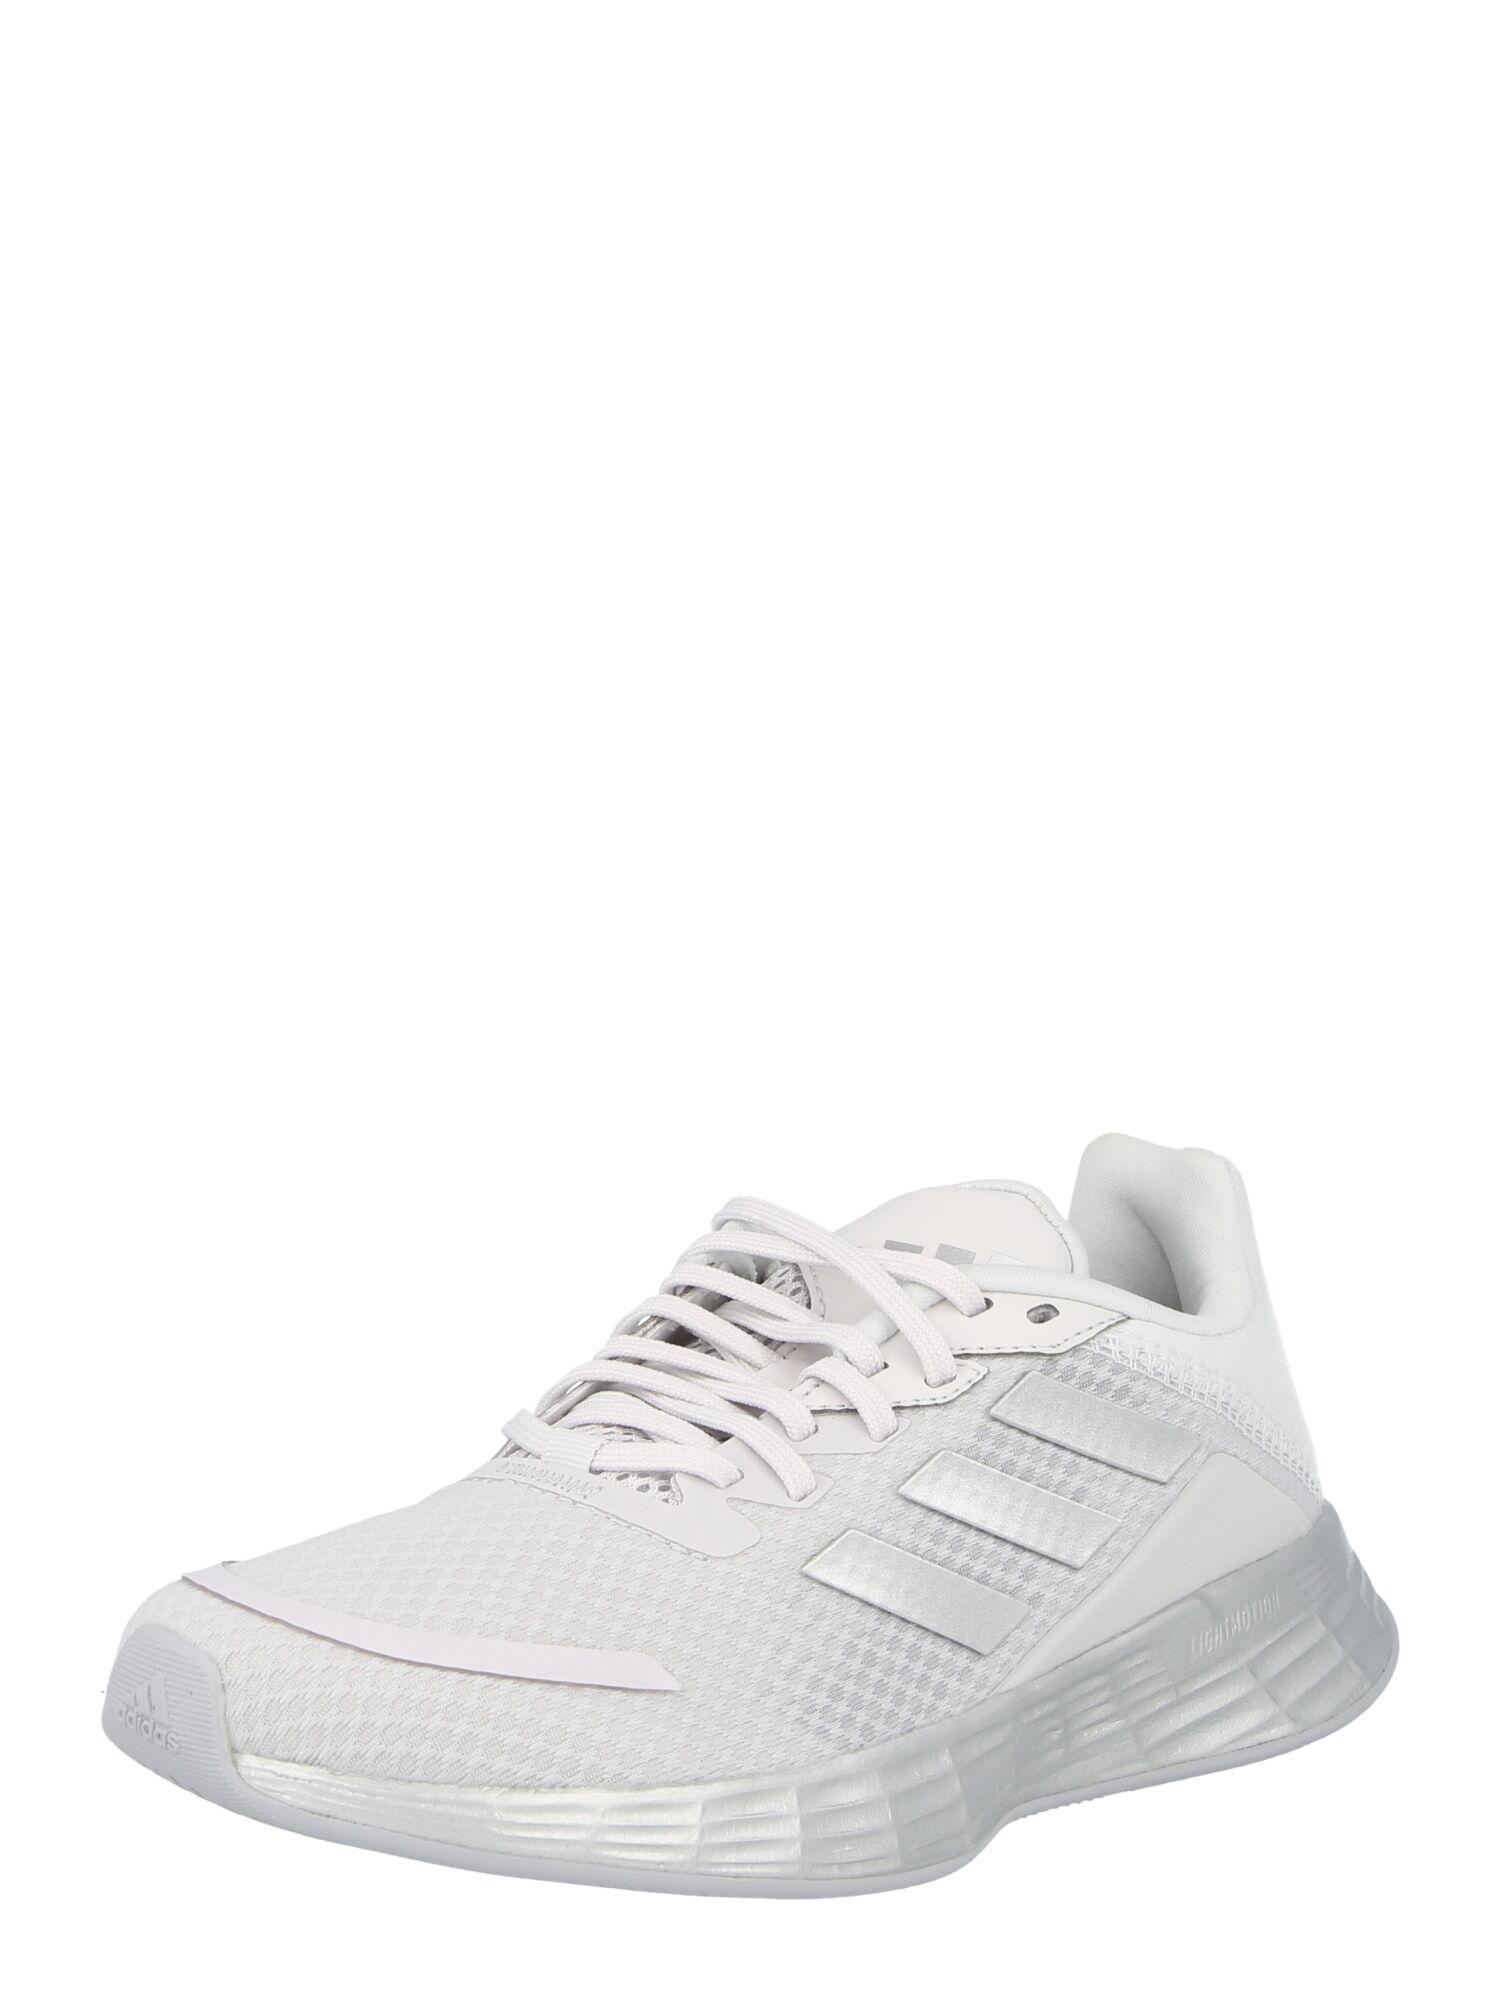 ADIDAS PERFORMANCE Chaussure de course 'Duramo'  - Blanc - Taille: 8 - female